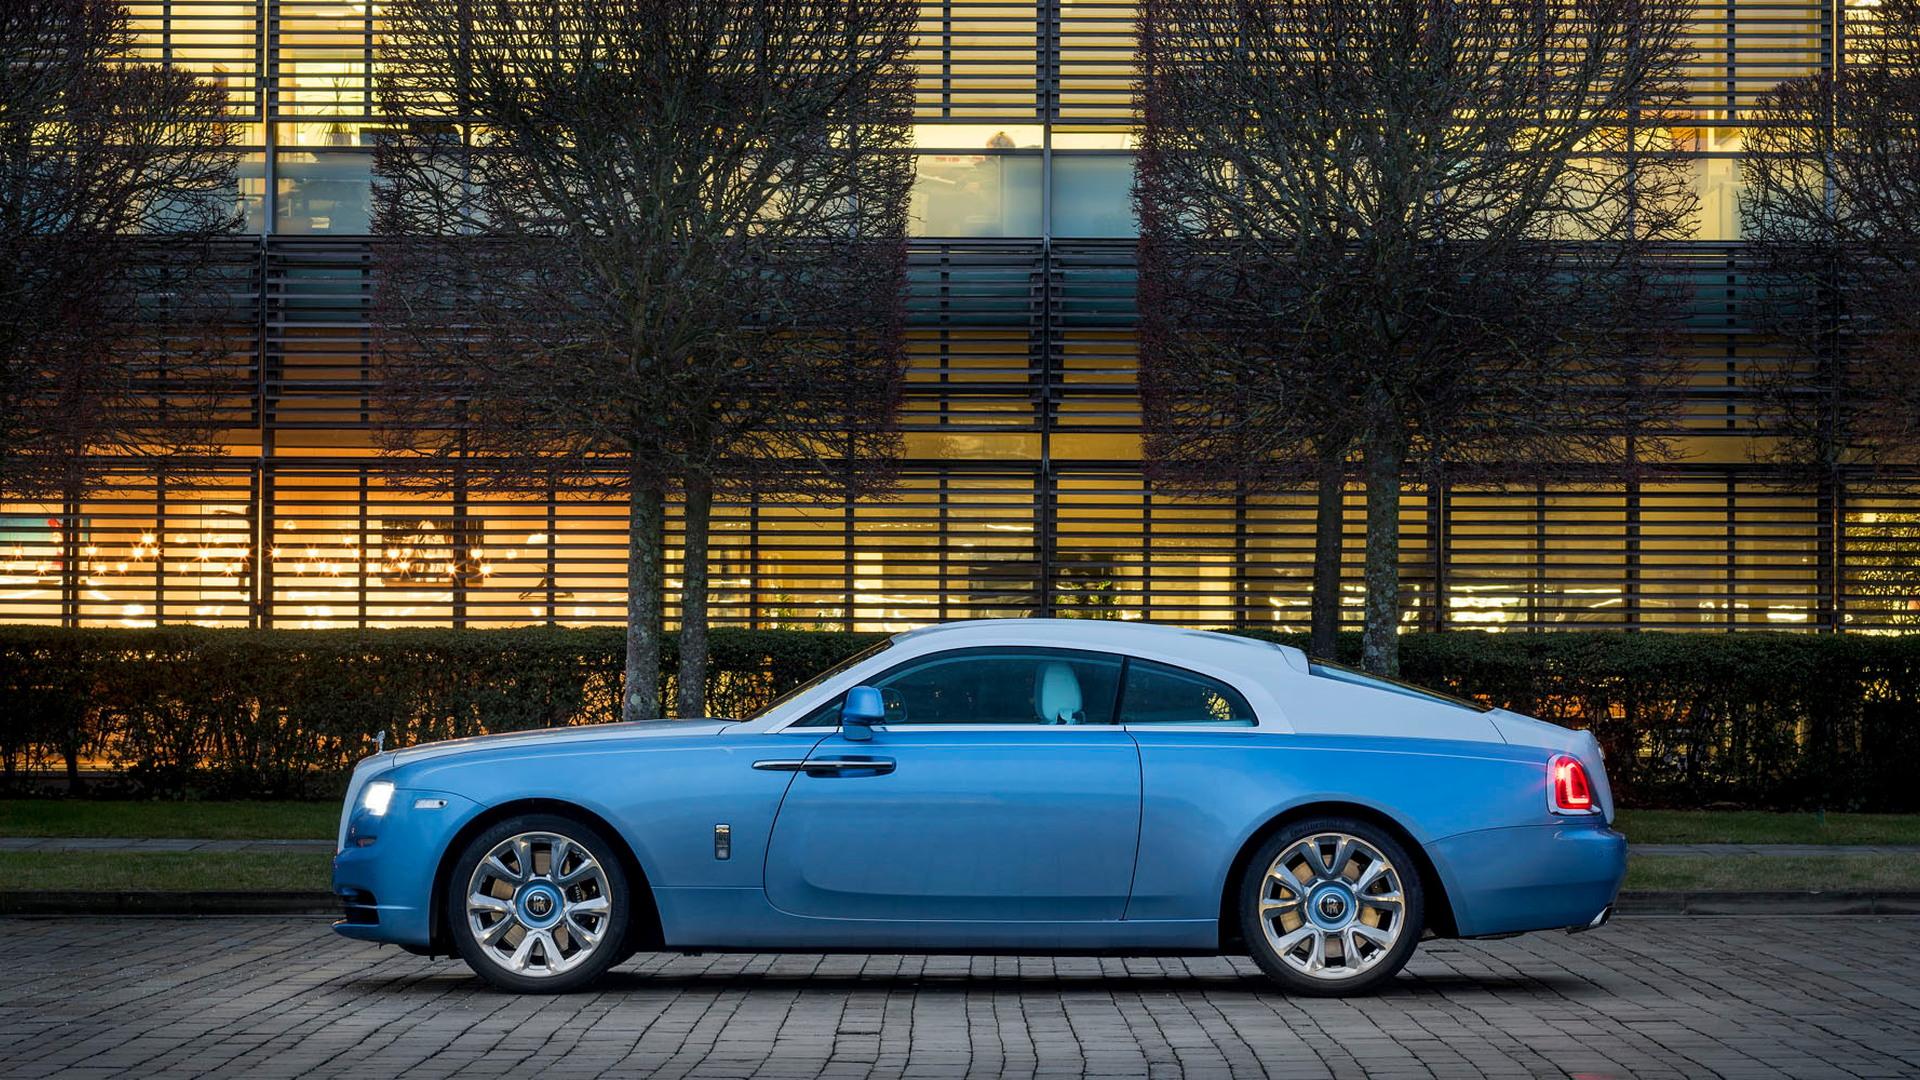 Rolls-Royce Bespoke Wraith Falcon Embroidery